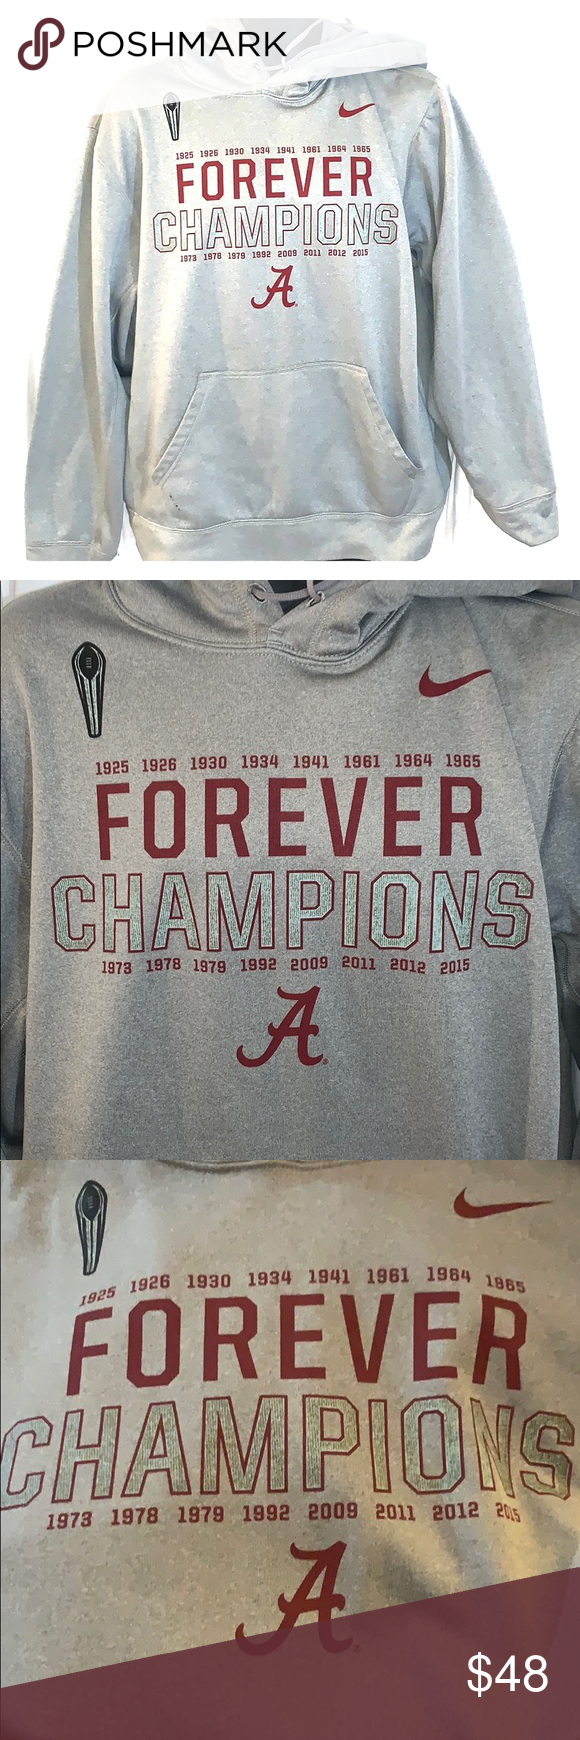 Men S Nike Gray Alabama Crimson Tide College Alabama Crimson Tide Clothes Design Sweatshirt Shirt [ 1740 x 580 Pixel ]